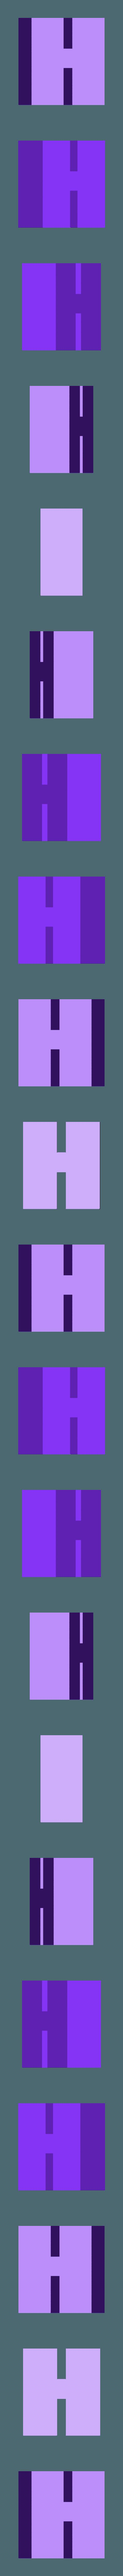 H.STL Download free STL file PhonePad • 3D printable model, doppiozero